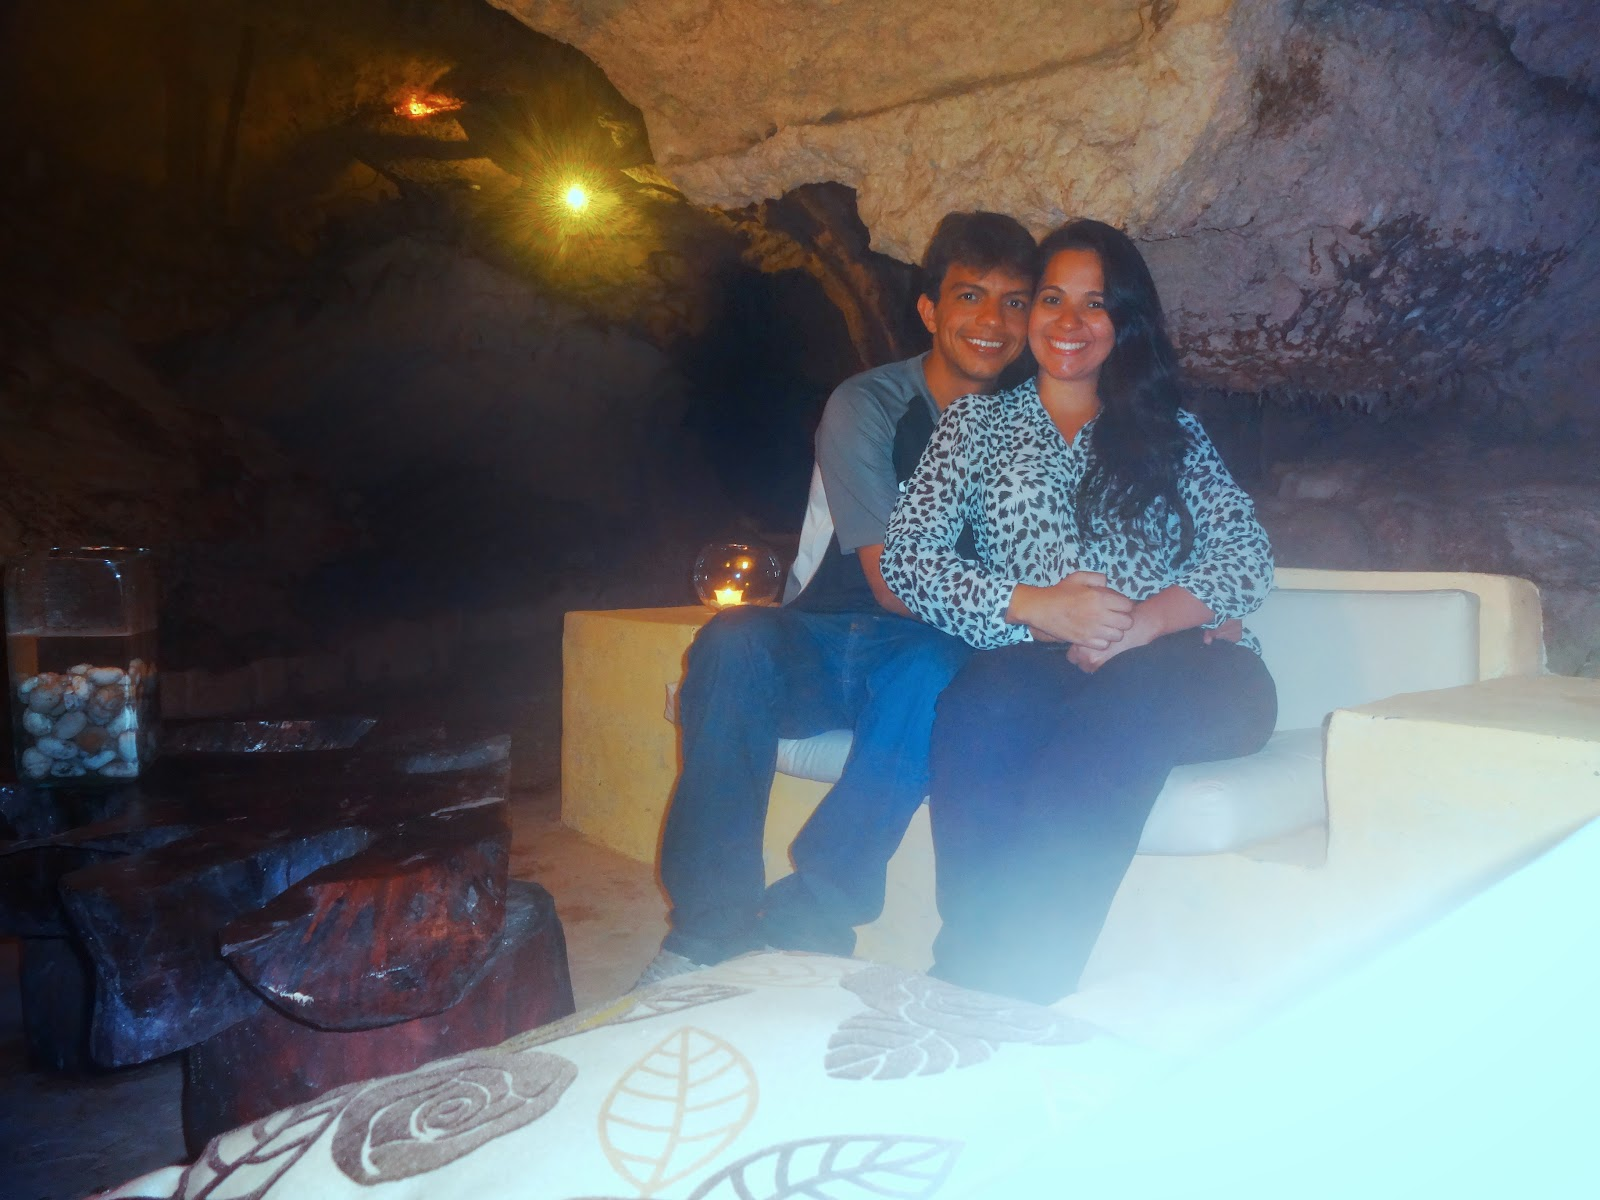 caverna - restaurante Alux - Playa del Carmen - Cancun